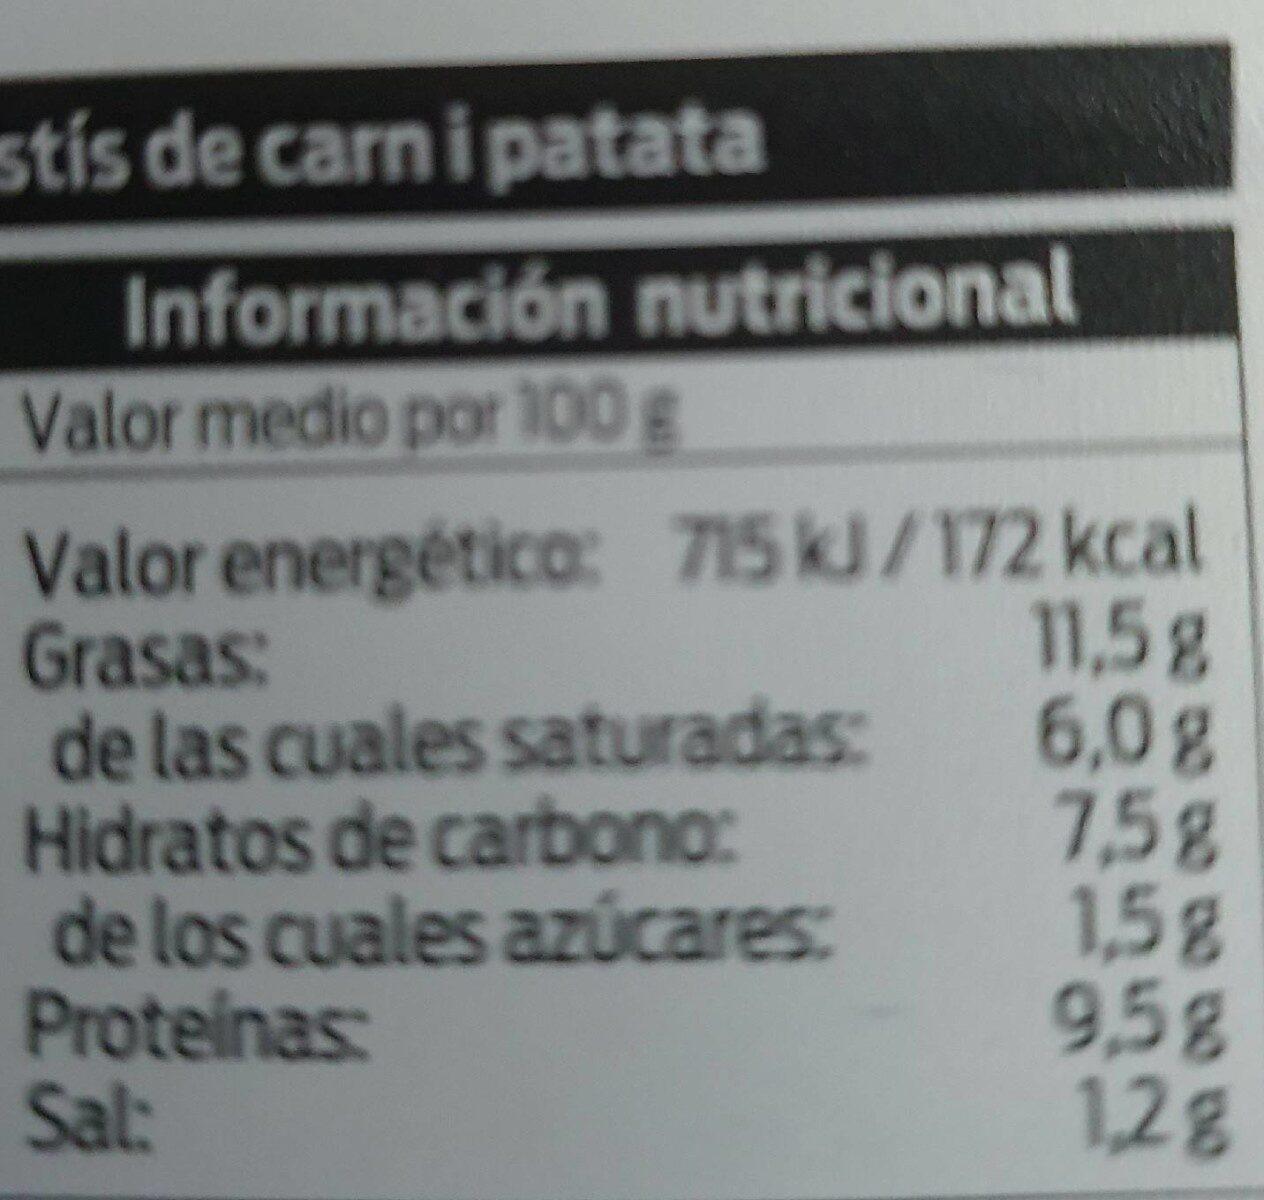 Pastel de carne y patata - Nutrition facts